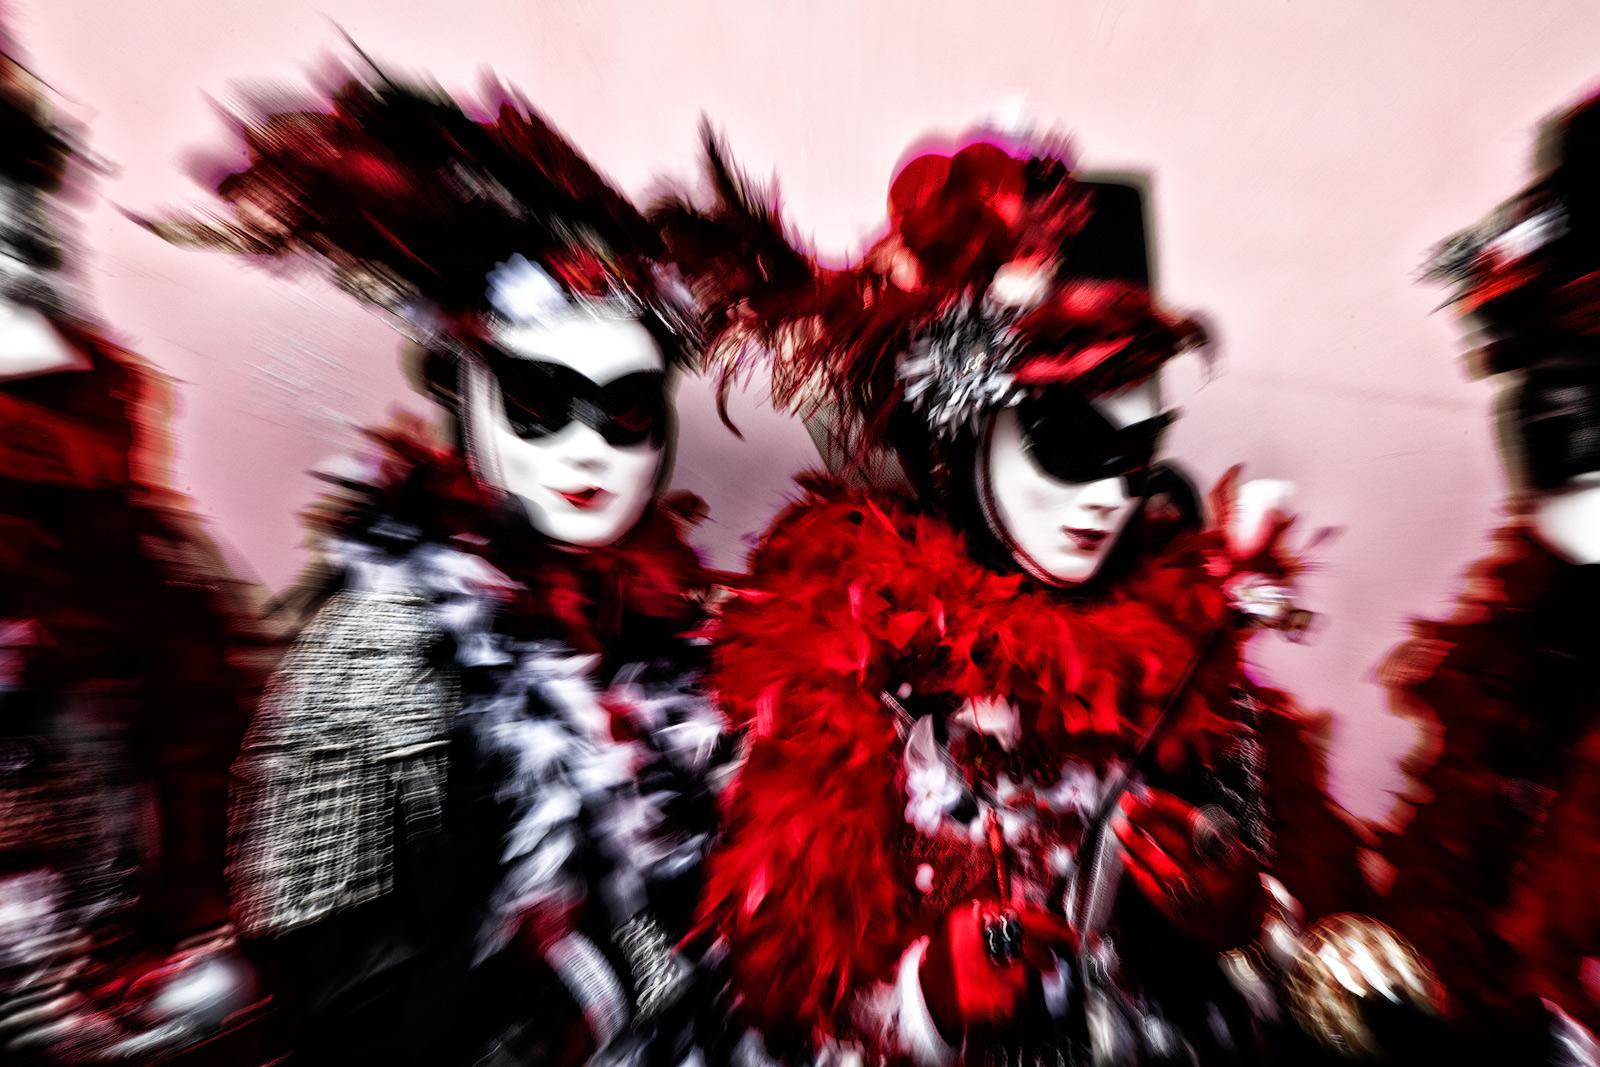 black, black & white, black and white, carnival, celebration, colorful, costume, europe, horizontal, italy, lens zoom, mask, party, red, venice, white, zoom, black & white, photo